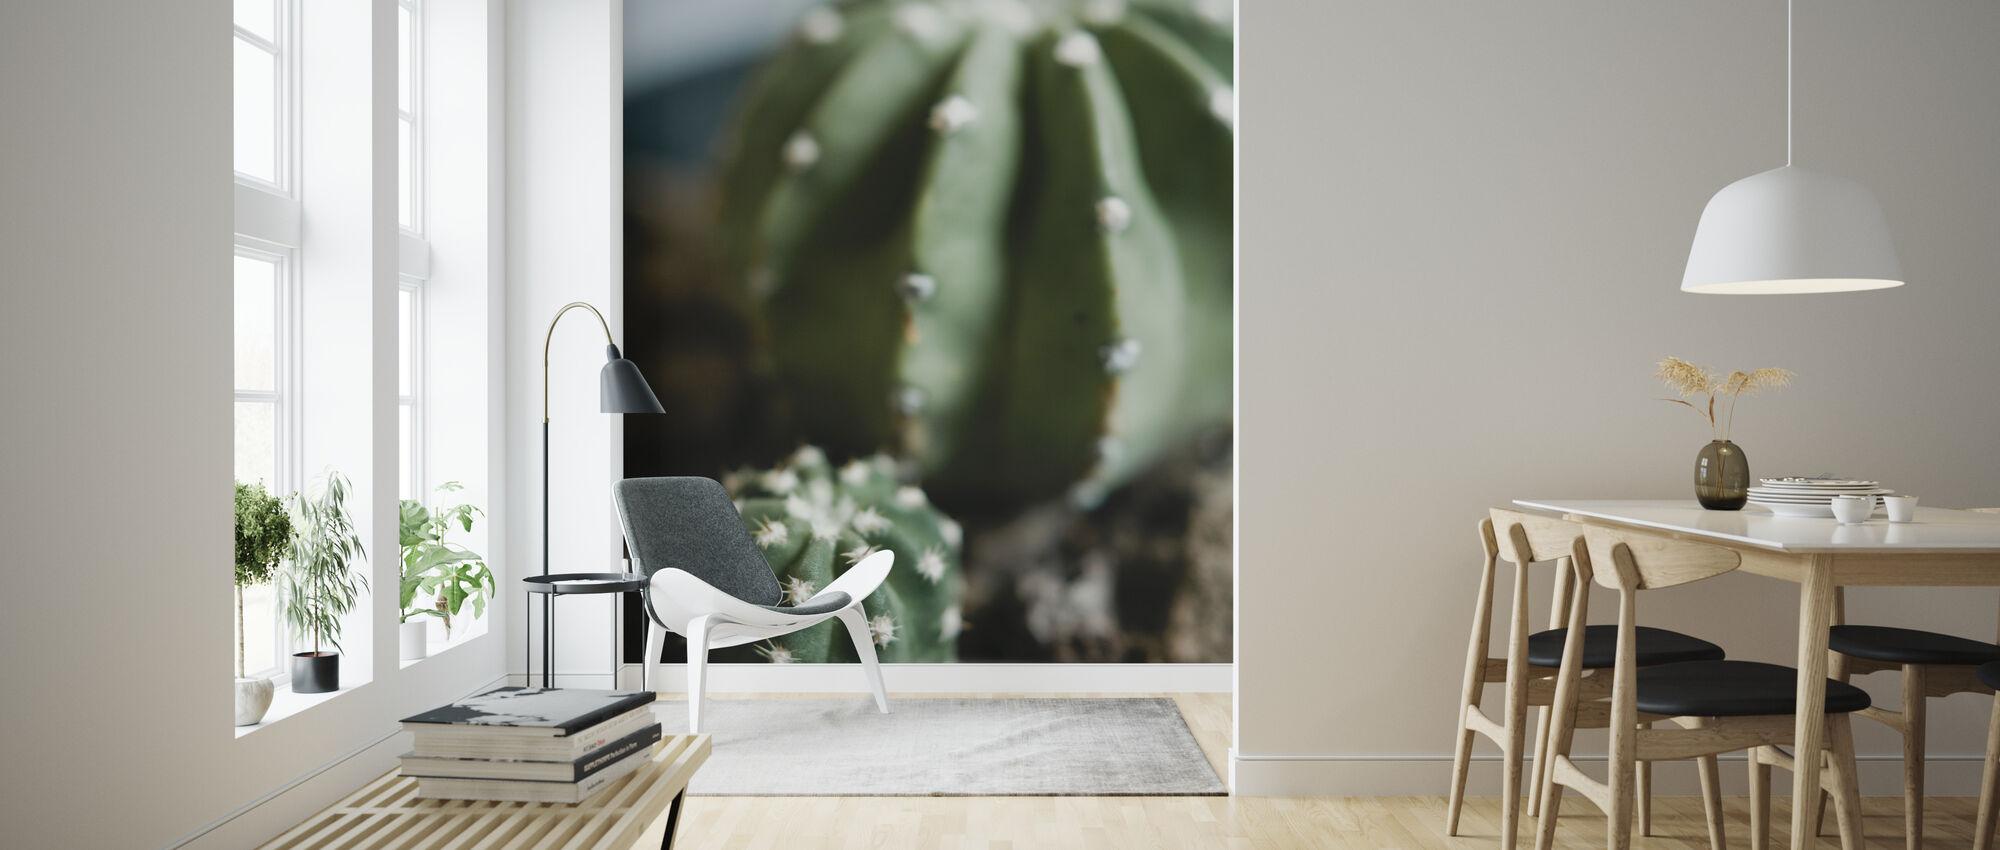 Echinopsis Cacti - Tapetti - Olohuone